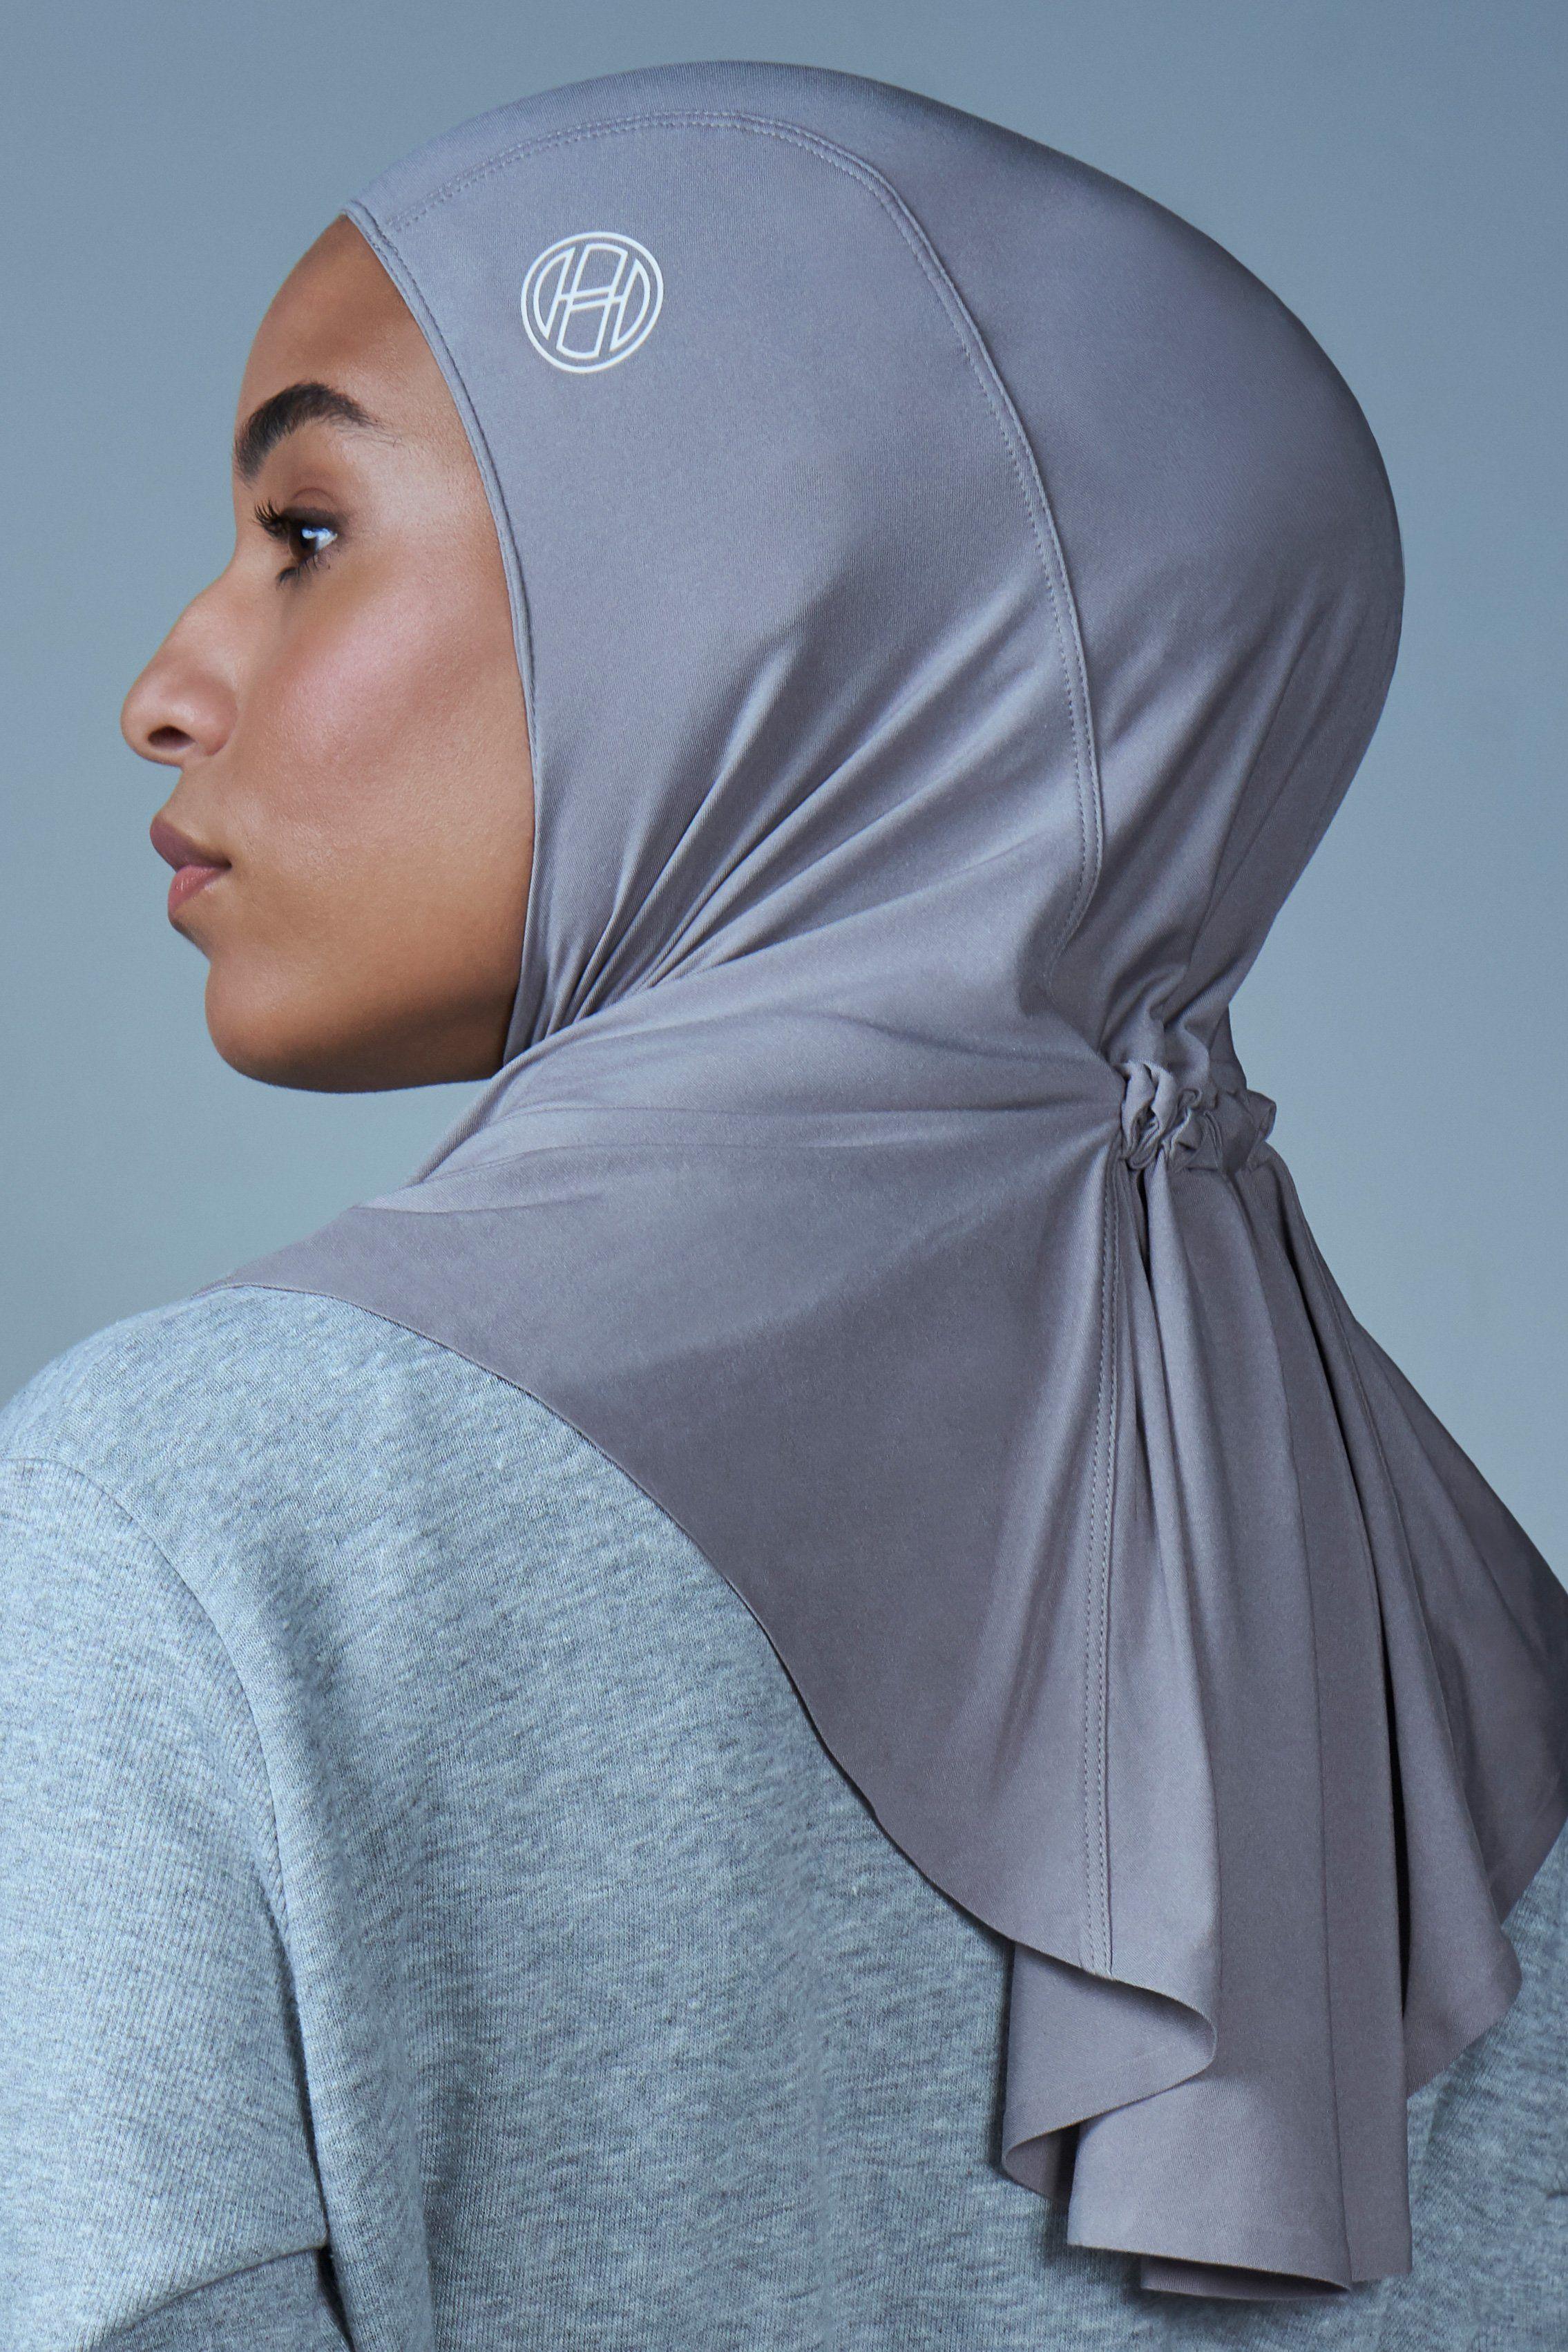 Flexfit Sport Hijab Smoke Size 1 Smoke In 2021 Sports Hijab Flexfit Hijab